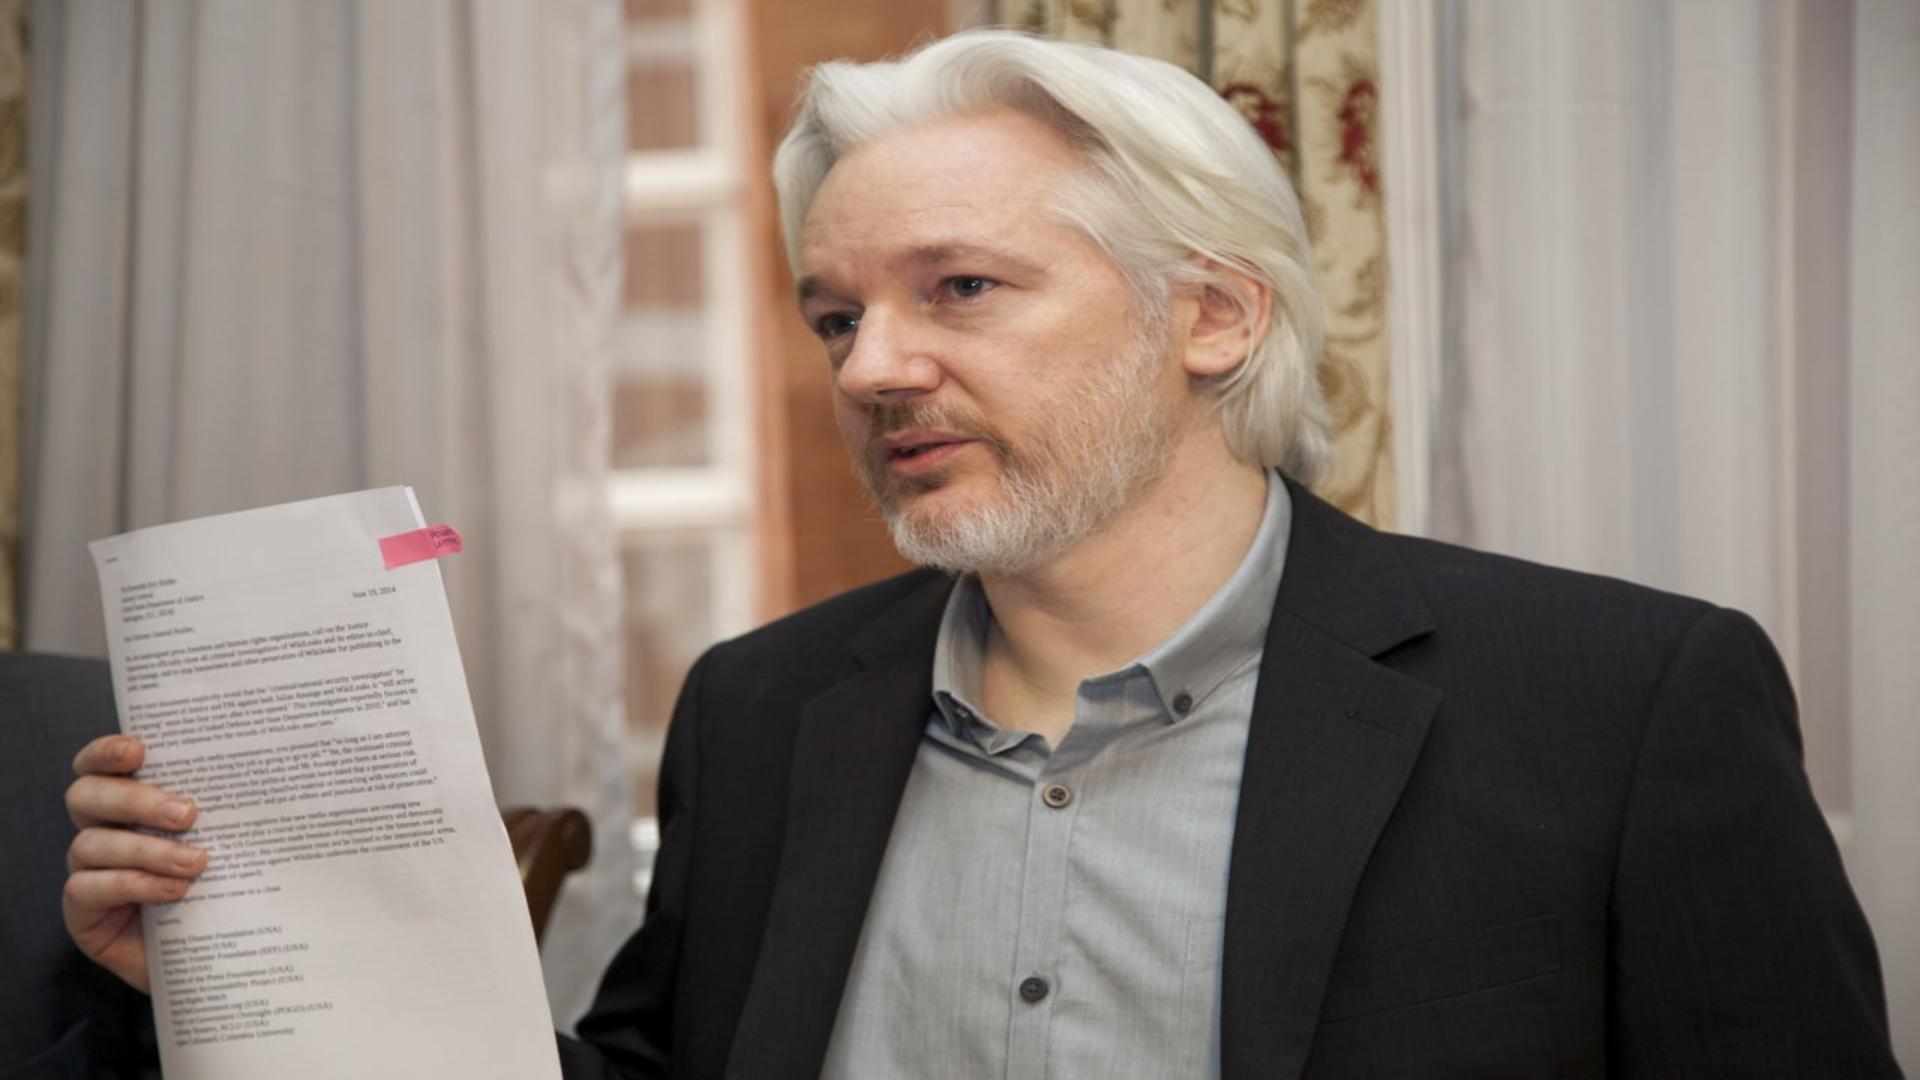 Julian Assange Verdict: Deathbed For Freedom of Speech